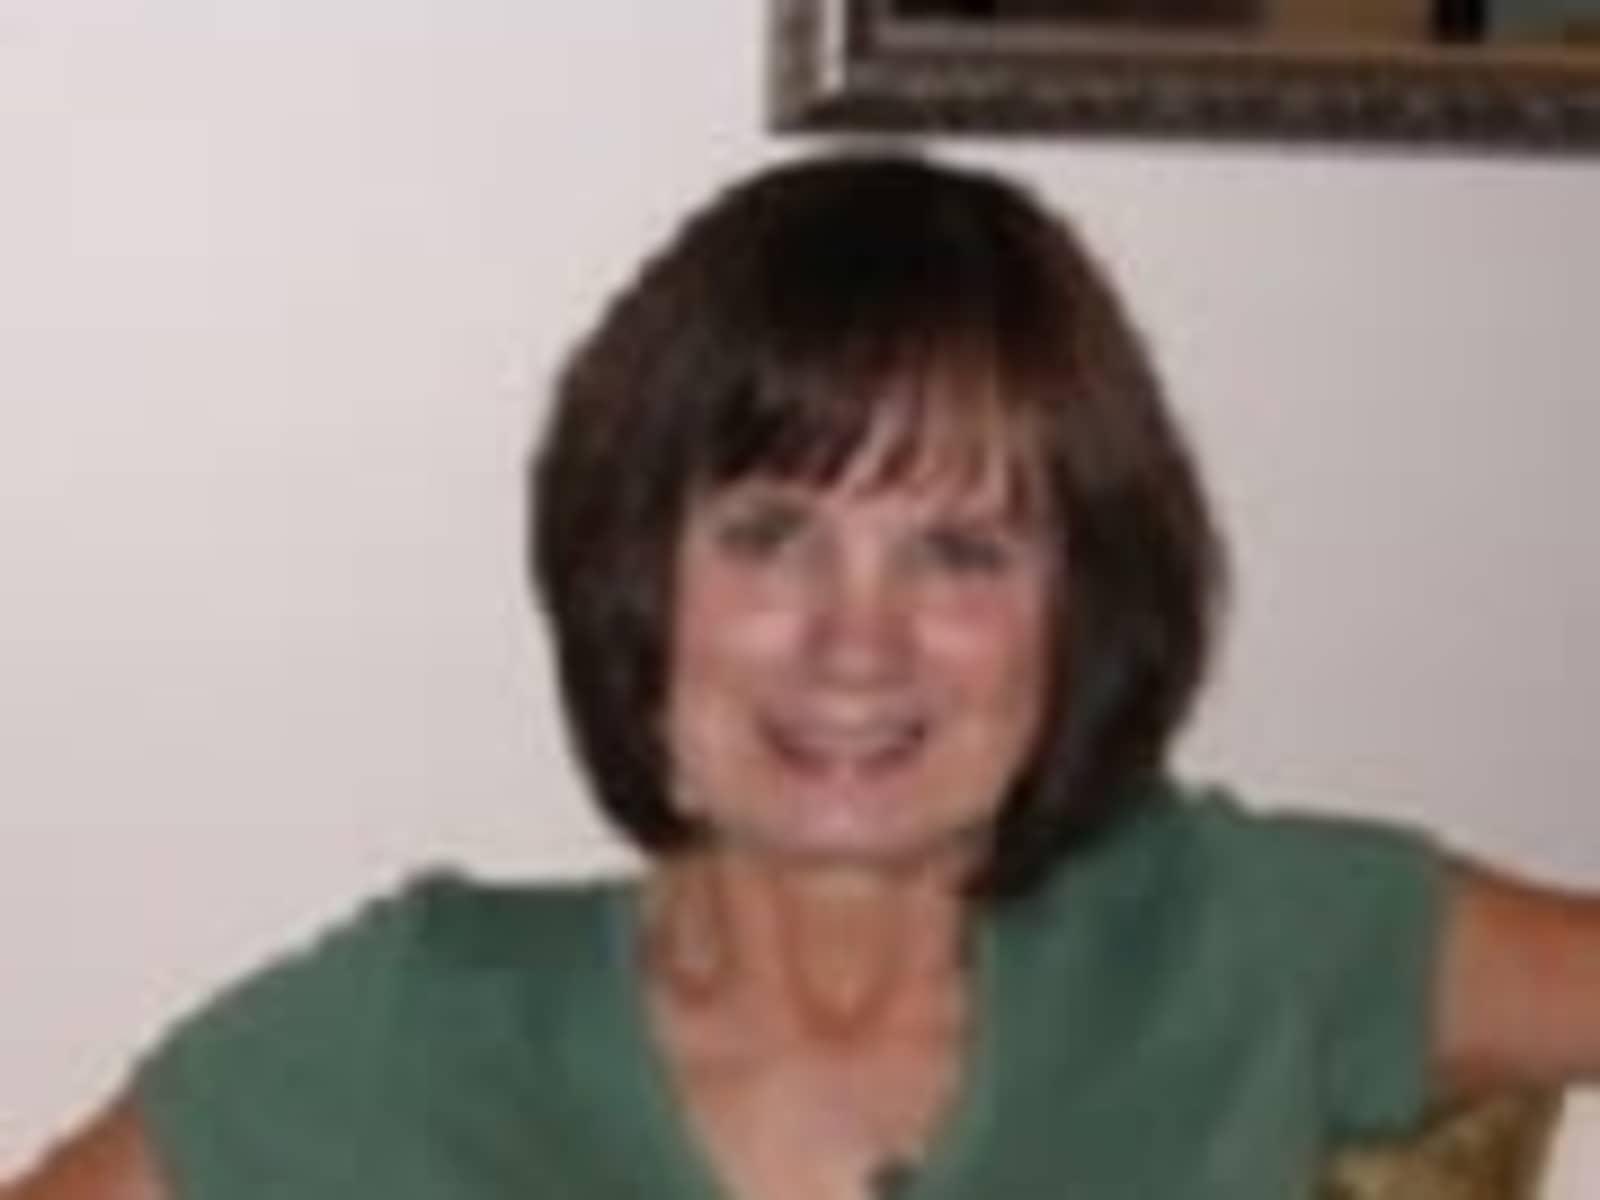 Barbara from Colorado Springs, Colorado, United States